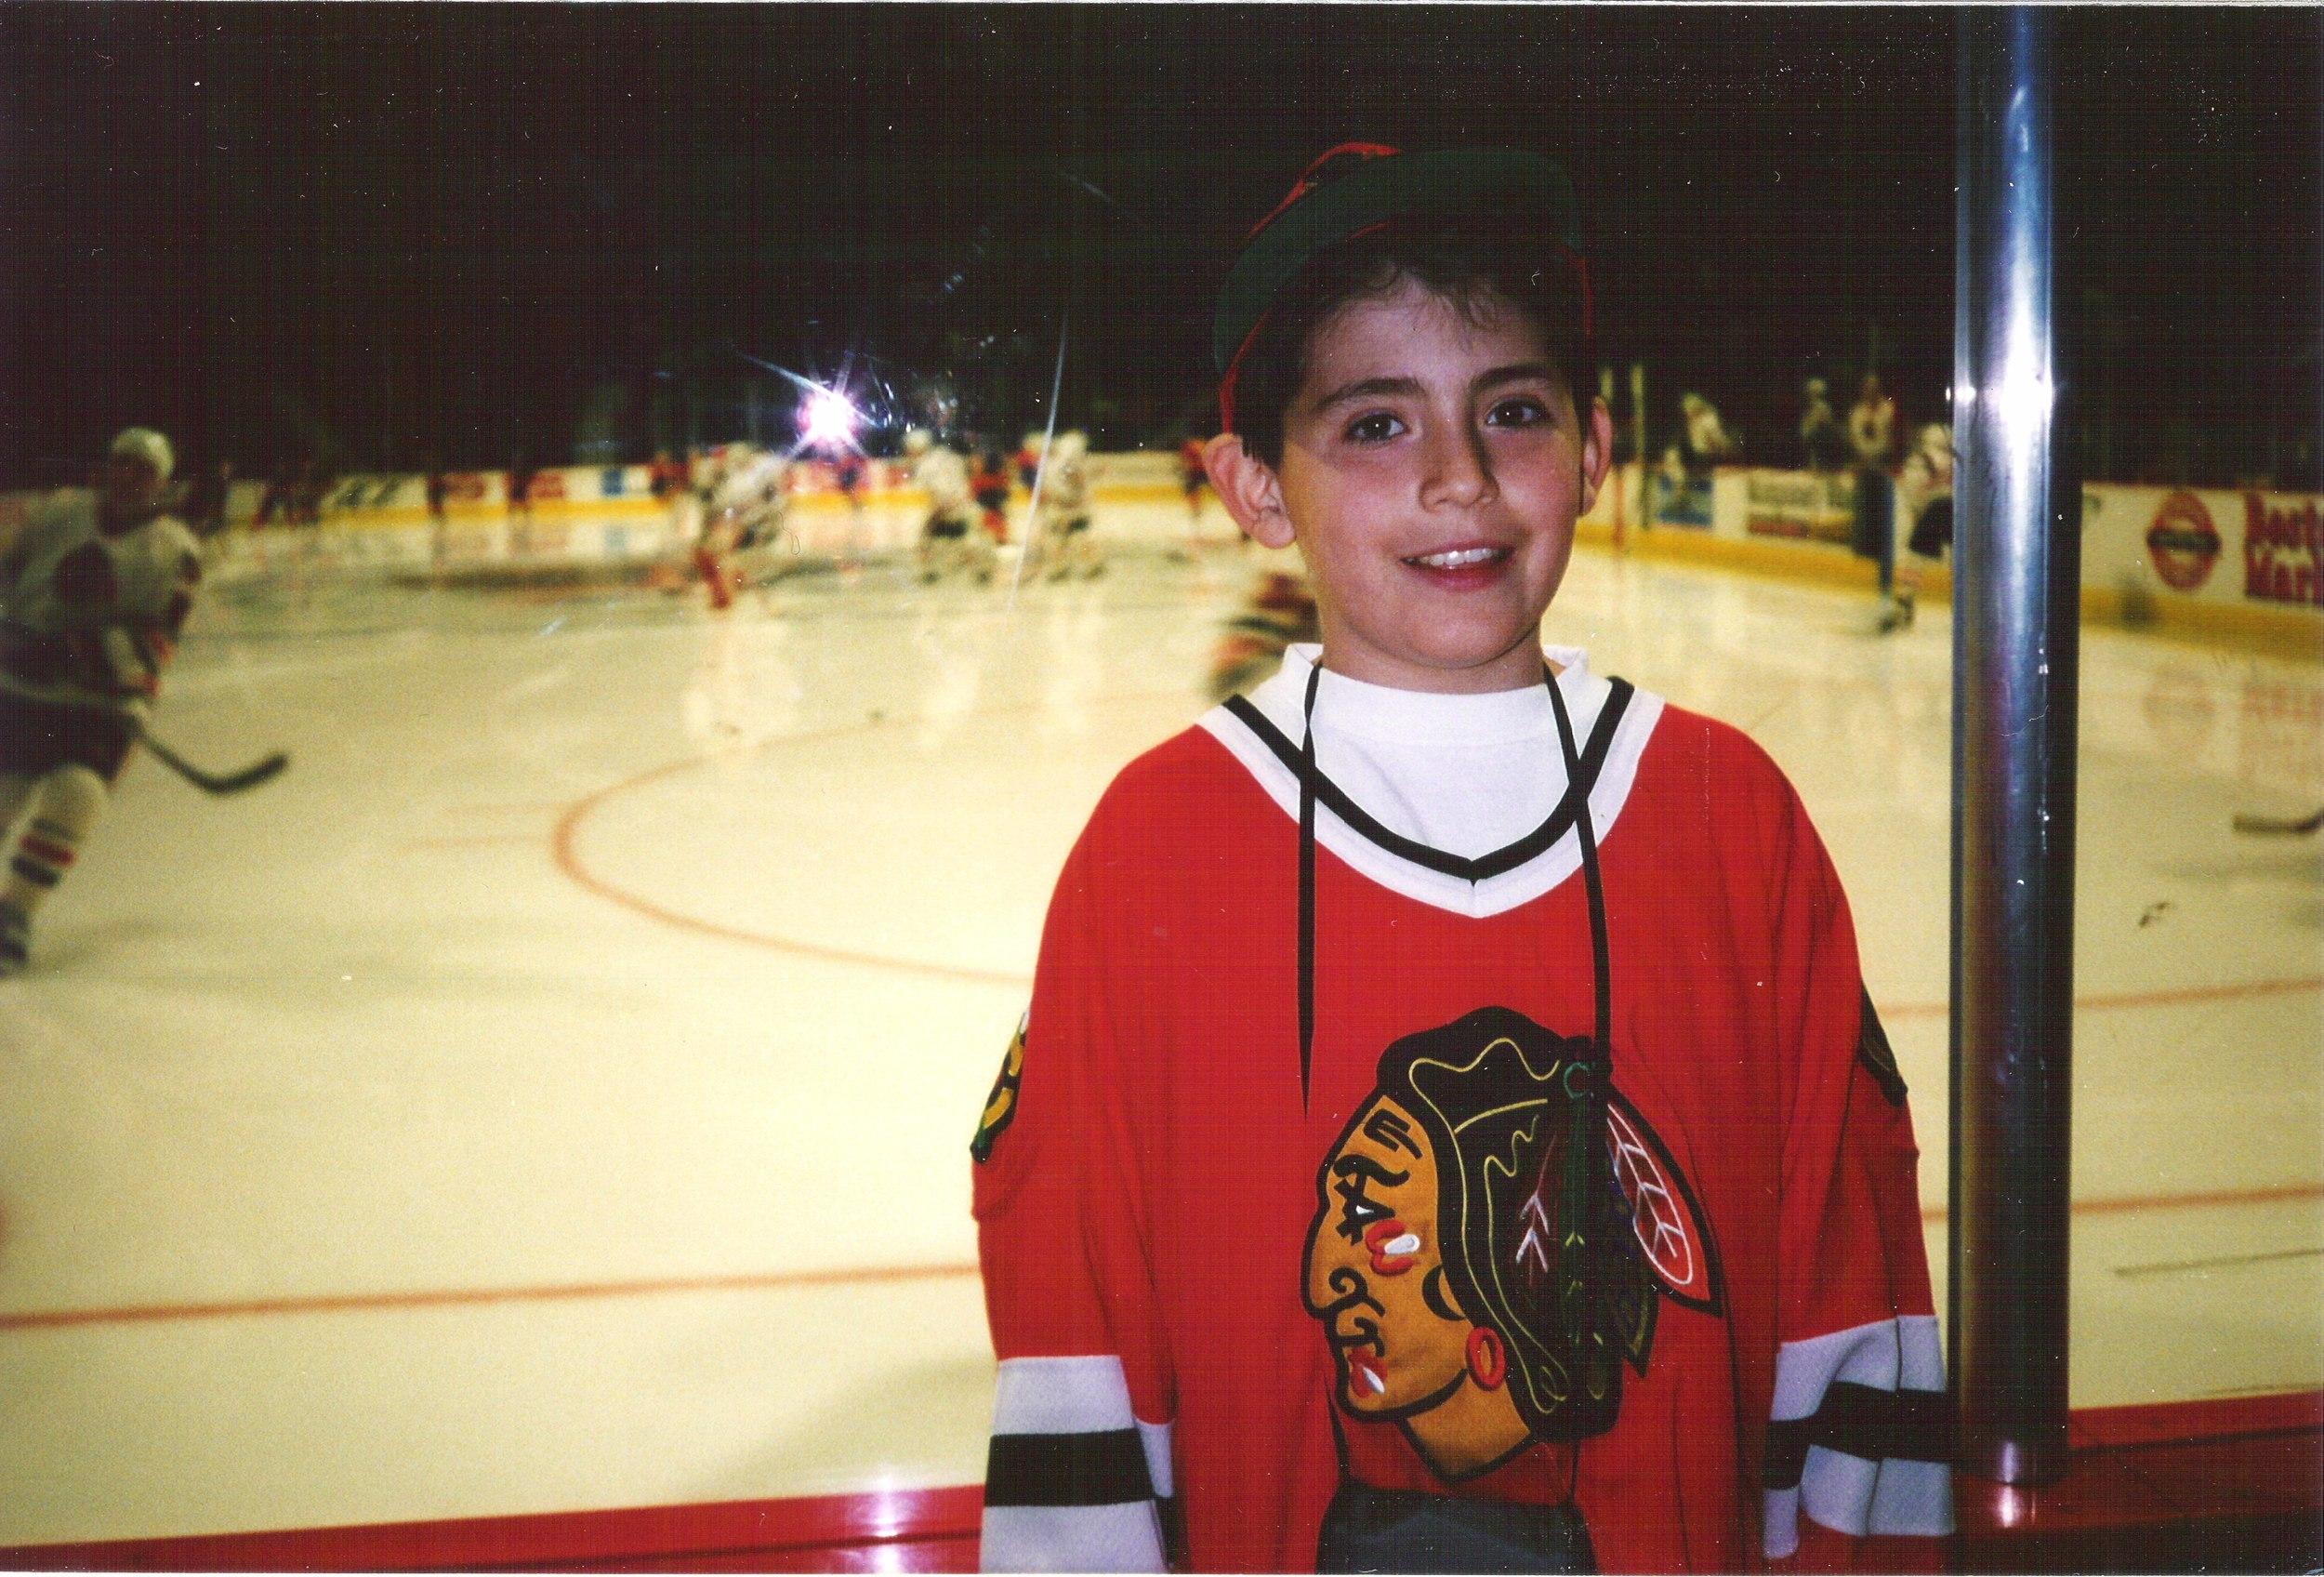 Young Chris Hawks